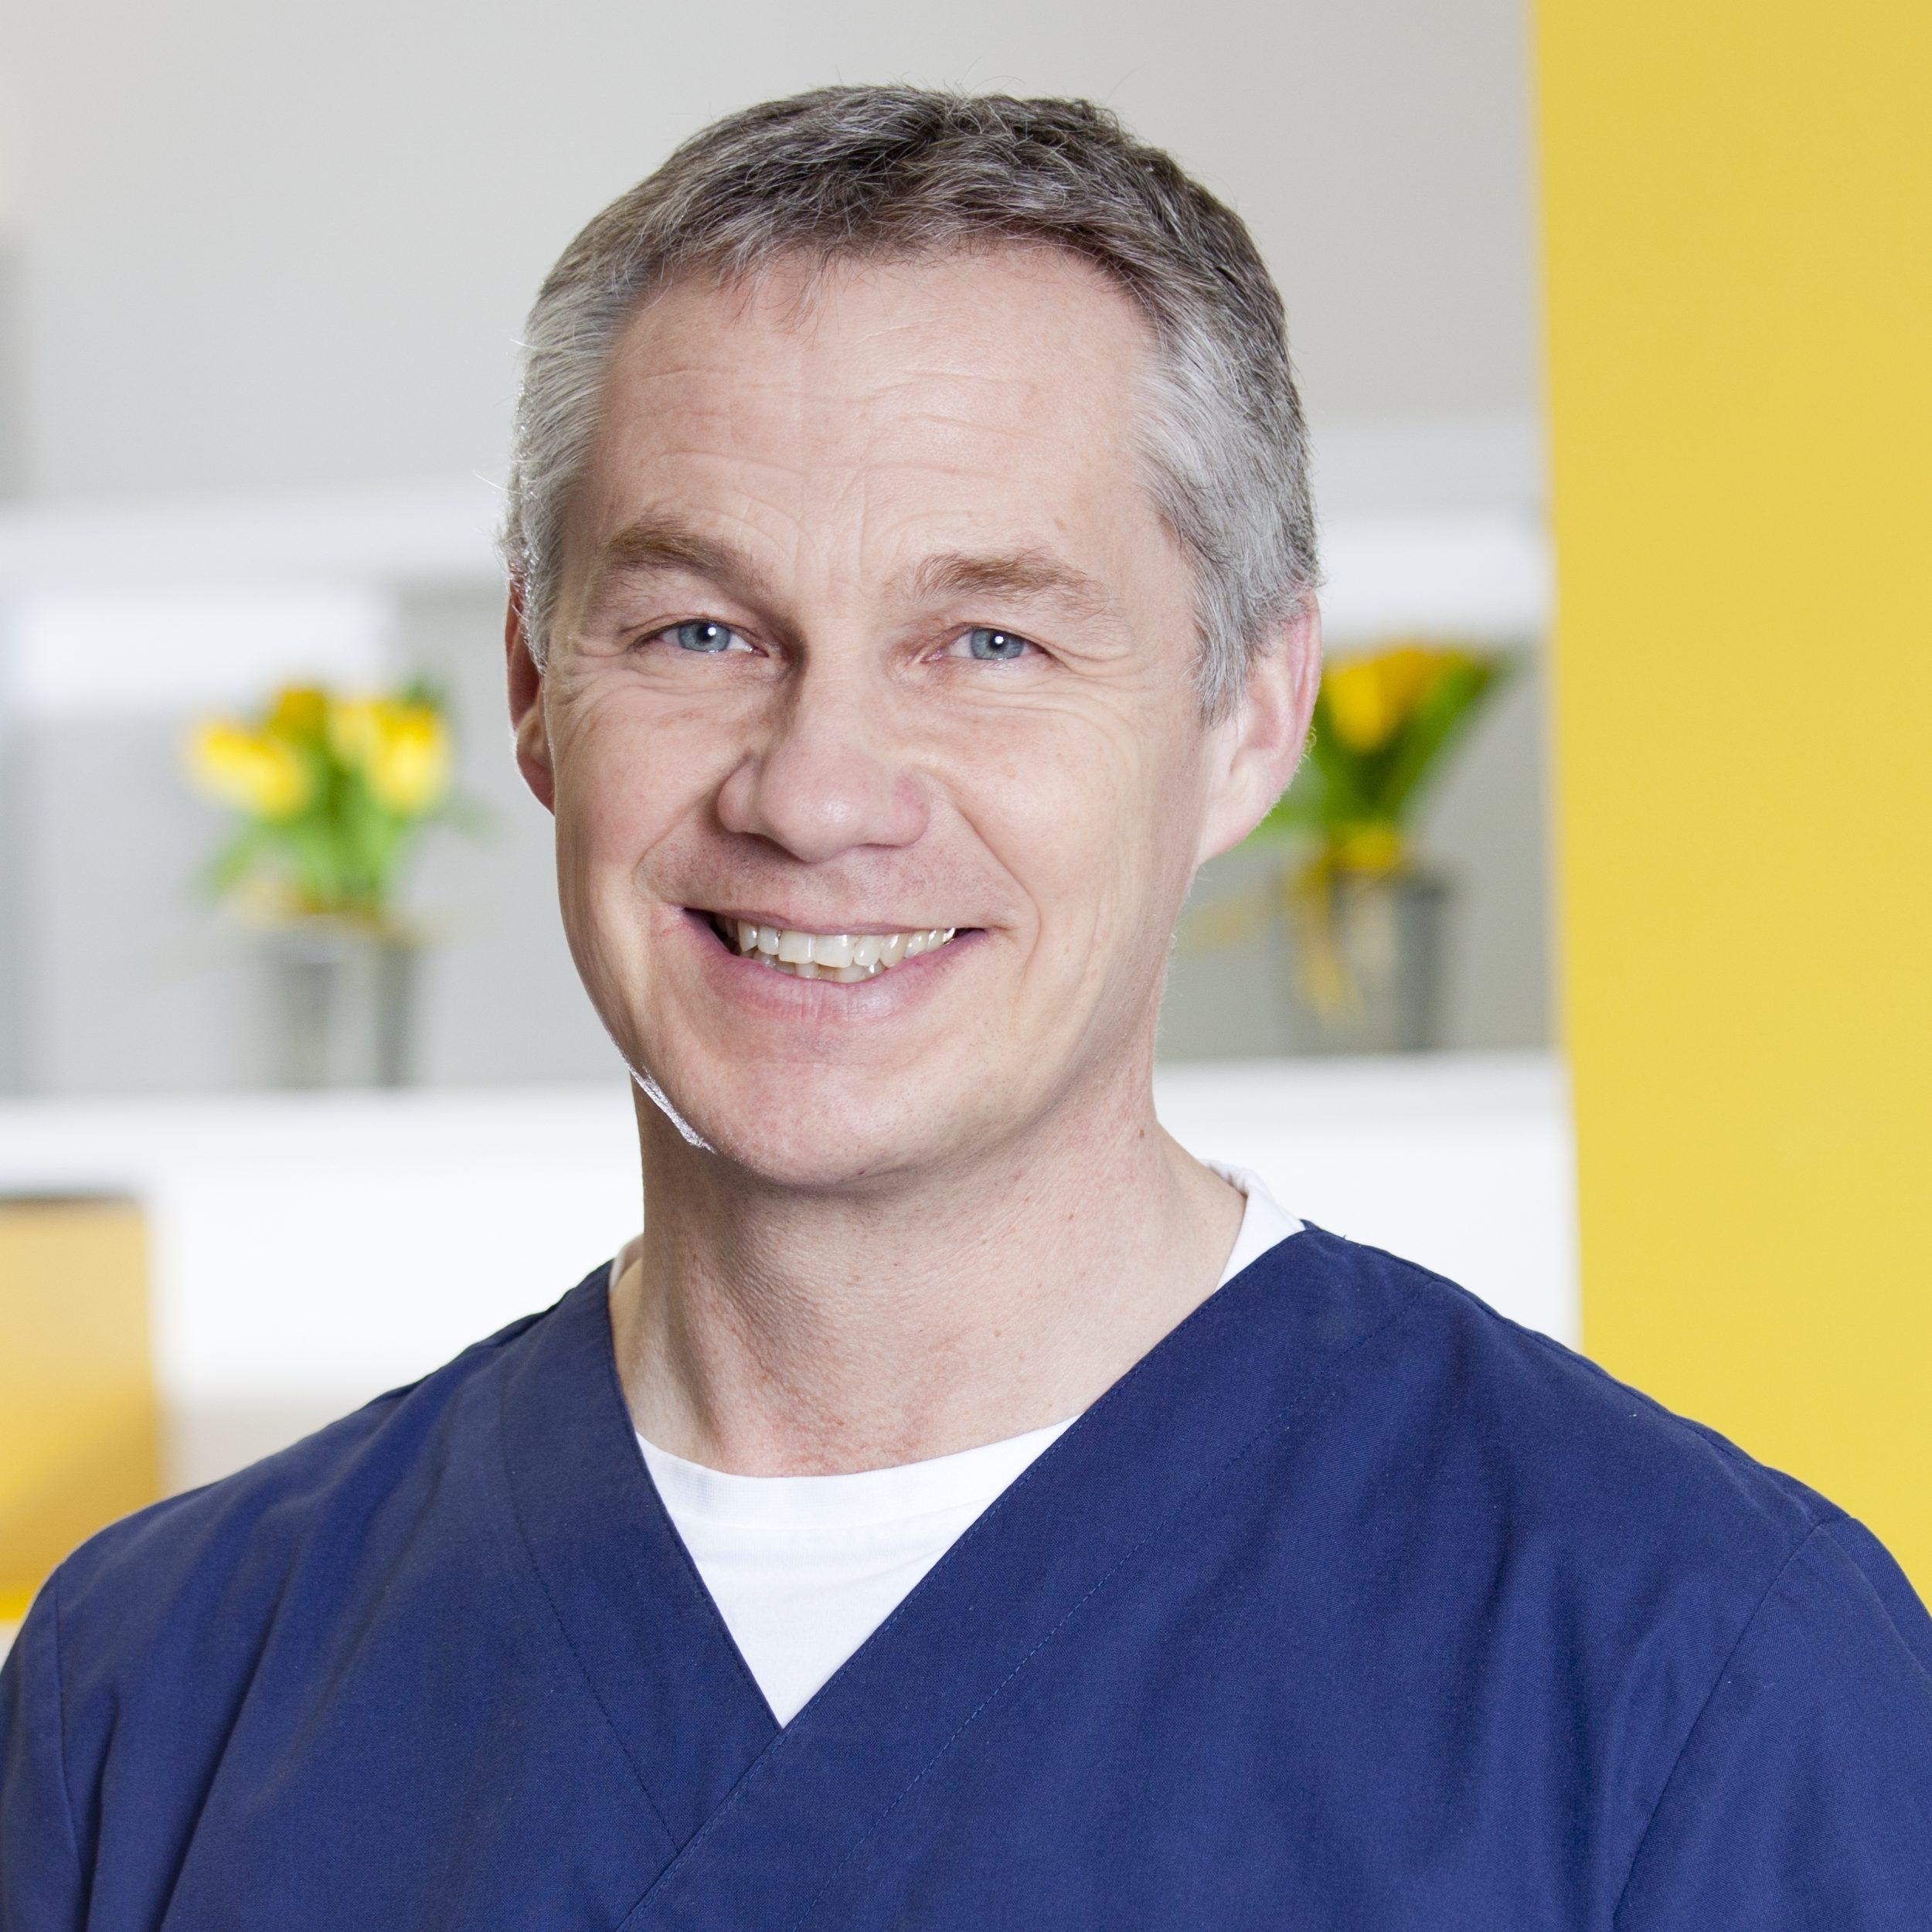 Dr. Markus Hardenack